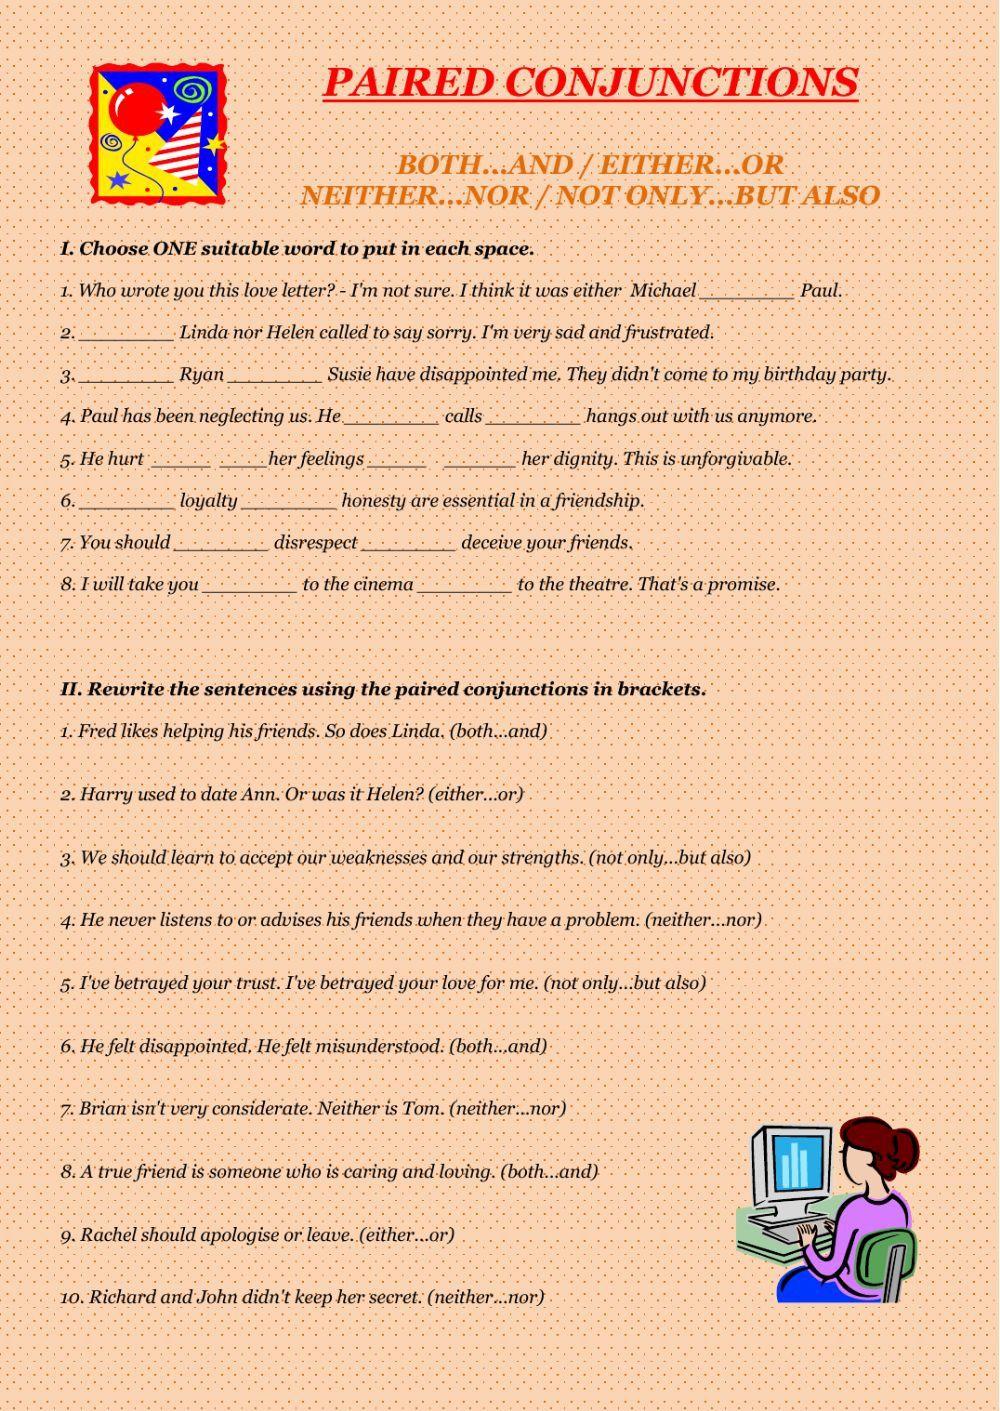 medium resolution of Correlative Conjunctions Worksheet 5th Grade Paired Conjunctions  Conjunctions Worksheet   Conjunctions worksheet